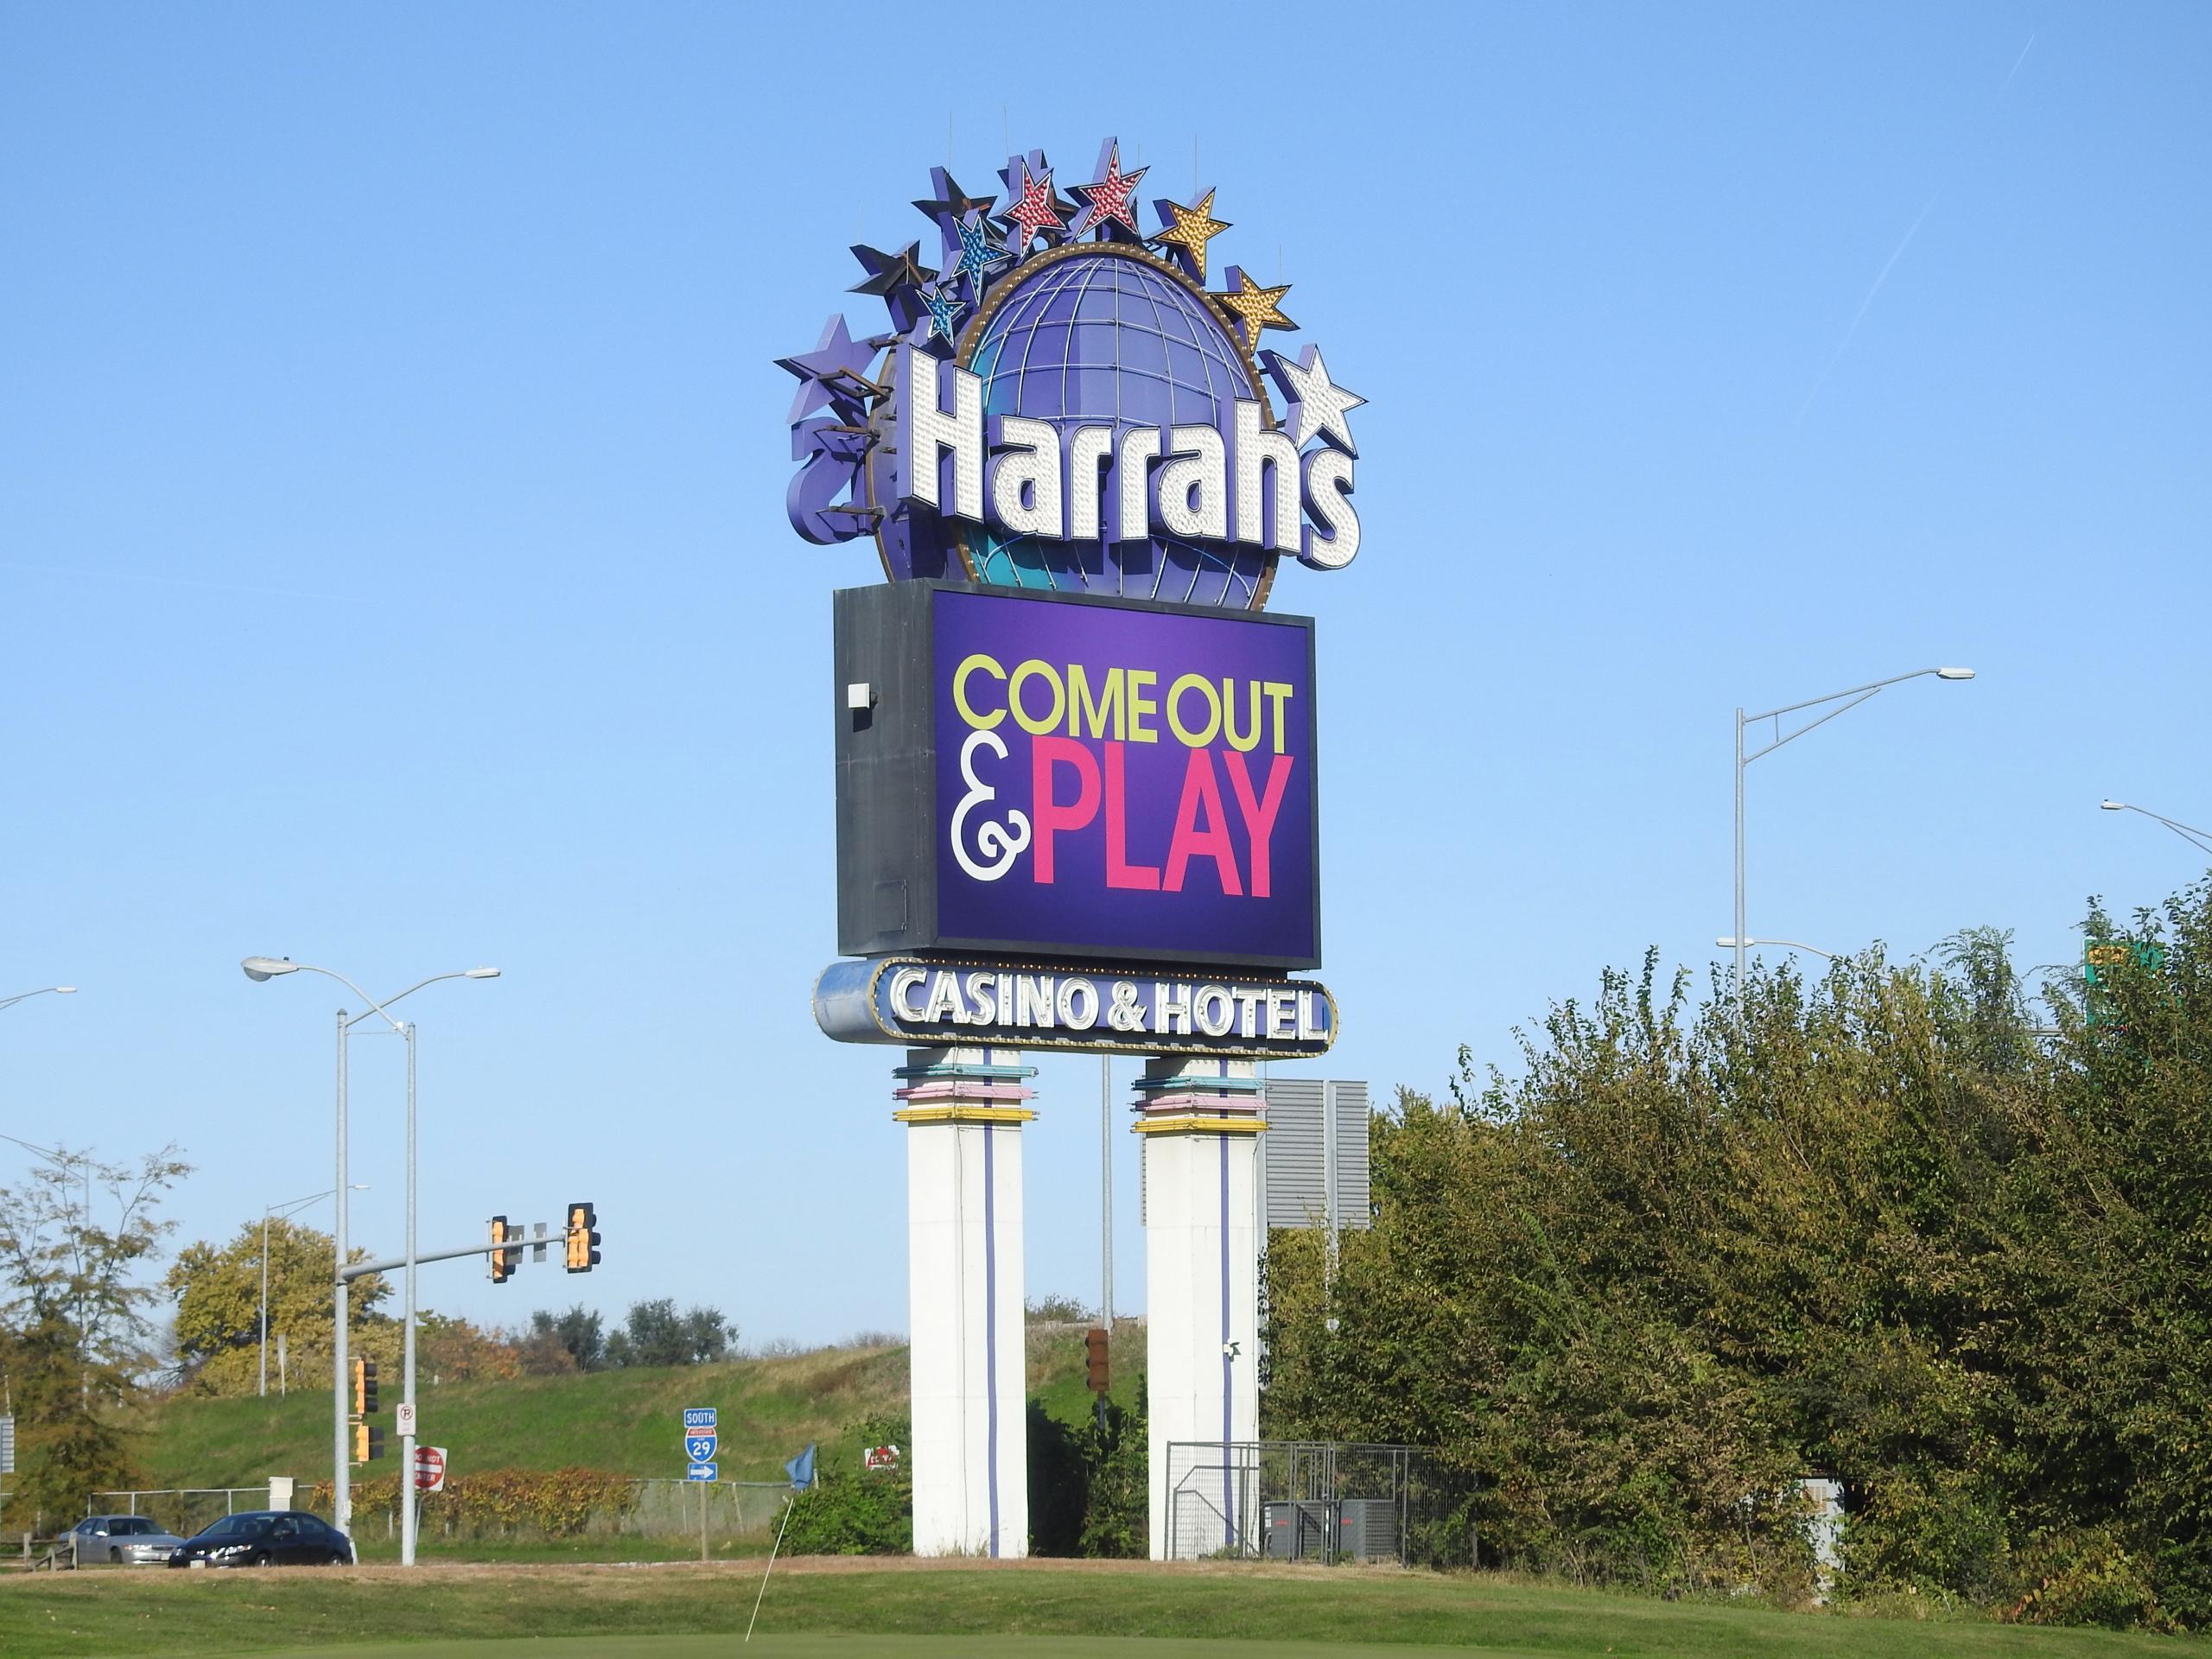 Signage for a Harrah's casino in Council Bluffs, Iowa.